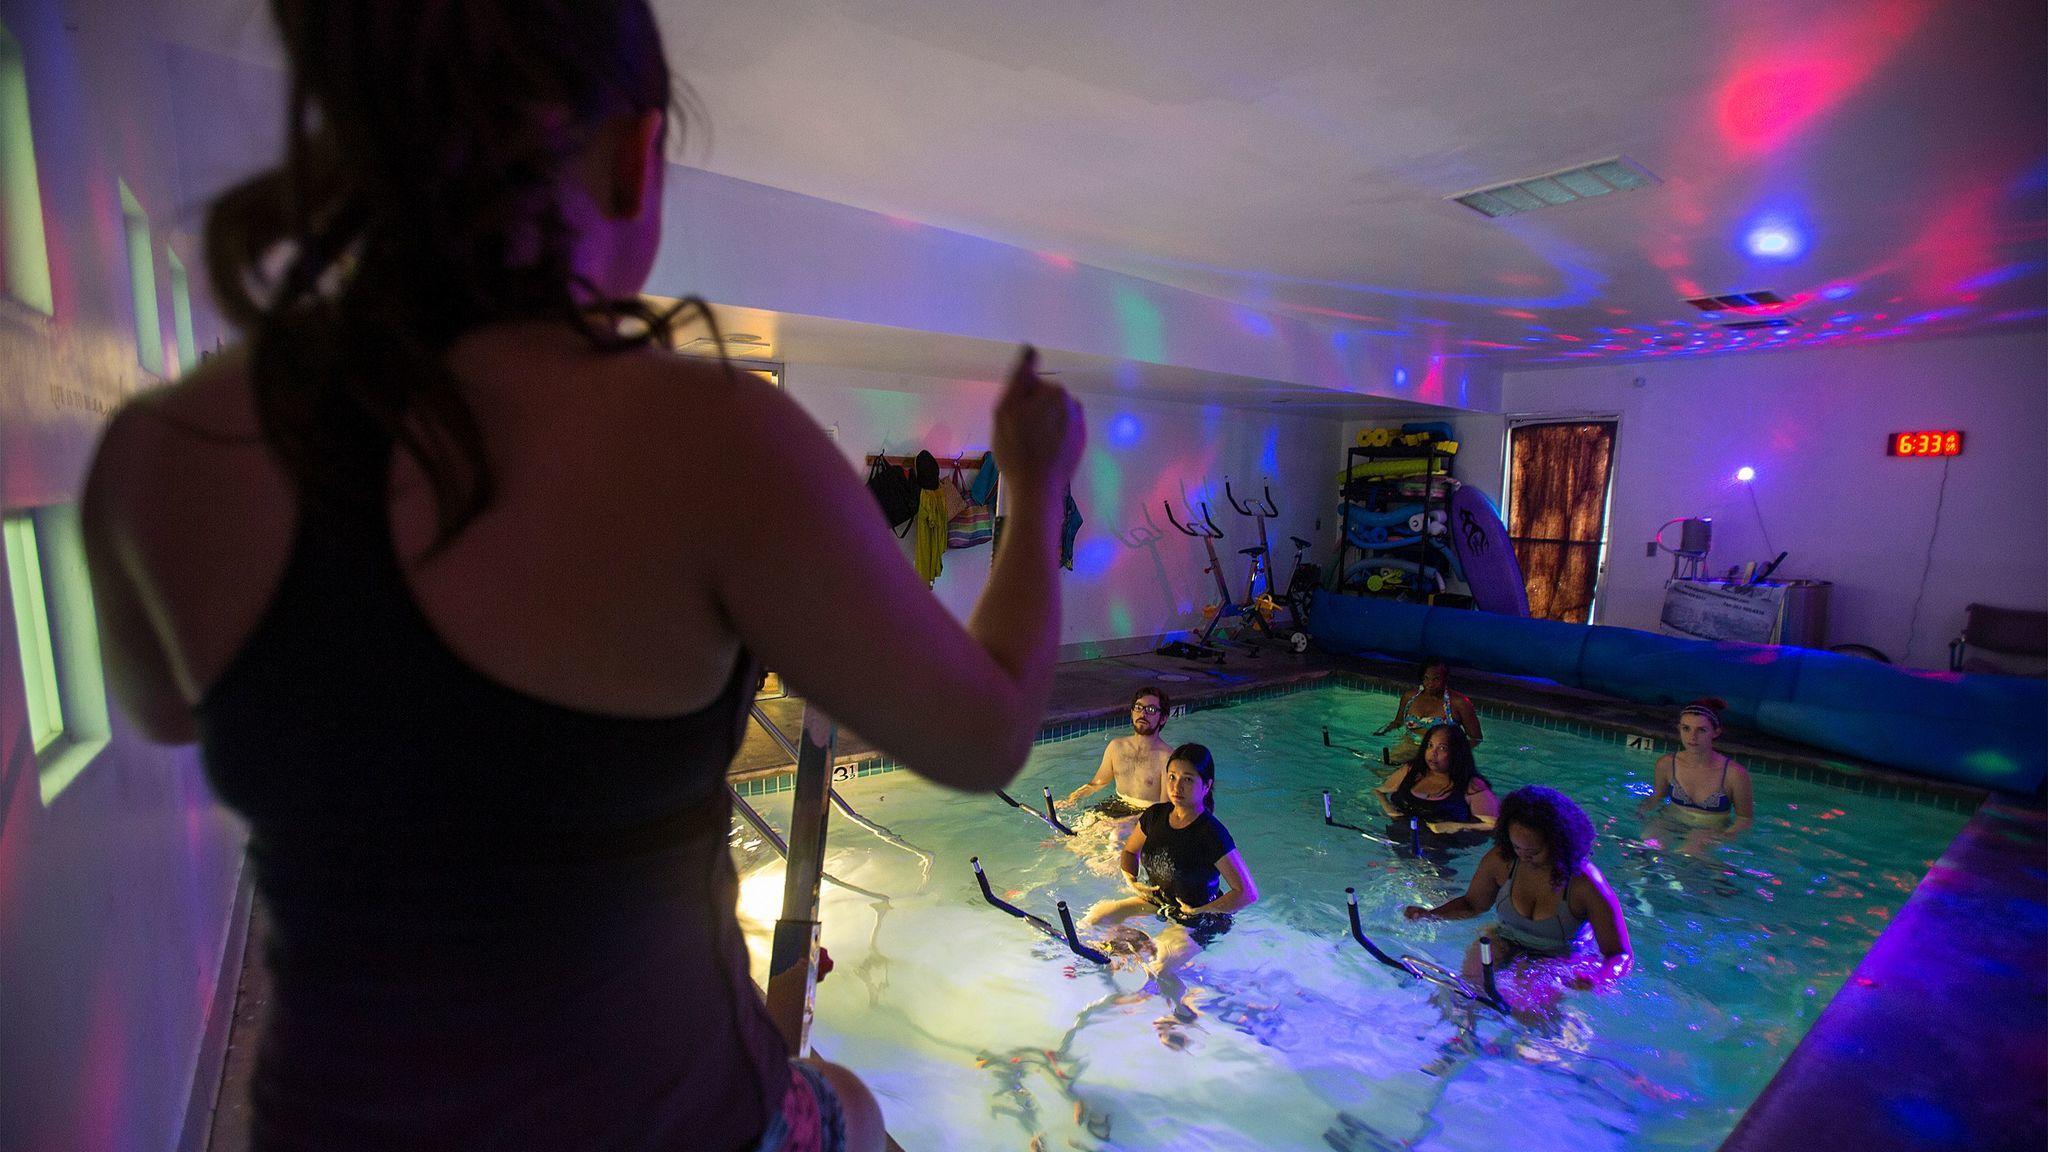 Aqua cycling class at Motion Plus Aquatic & Therapy Center.